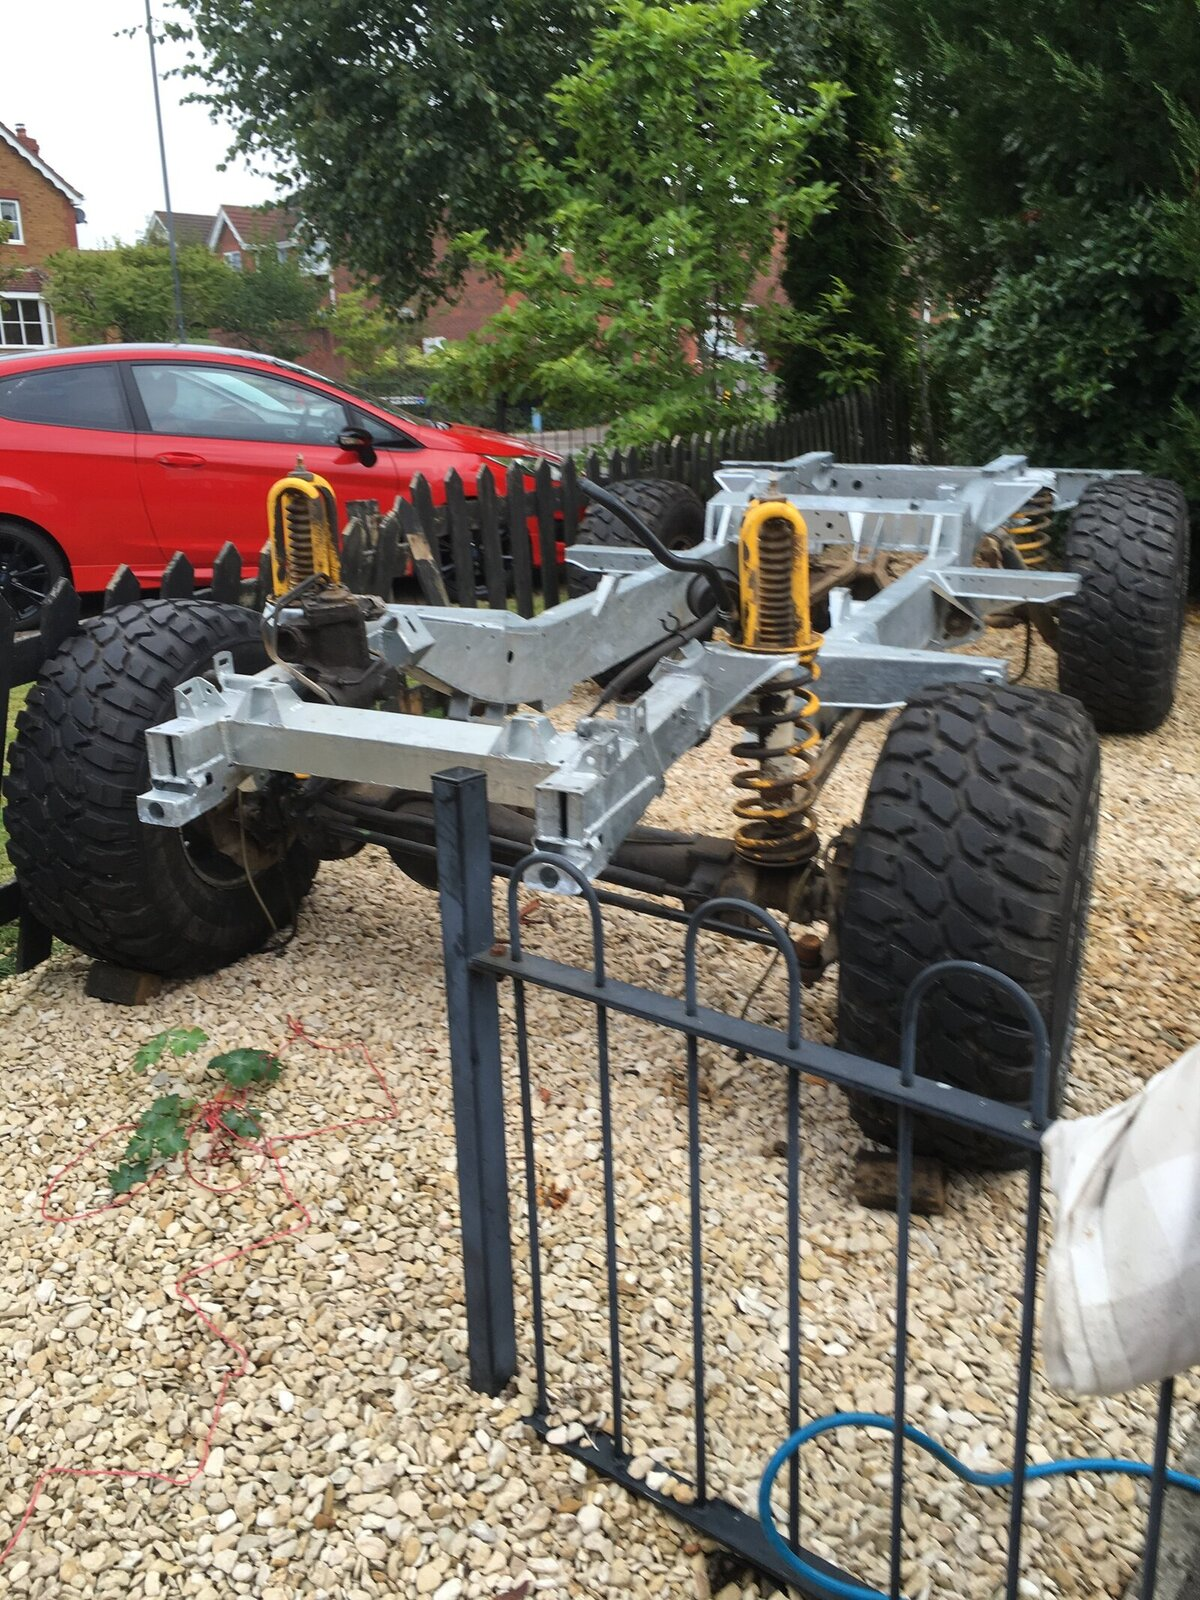 "Galvanised Land Rover 100"" defender chassis custom Richards"